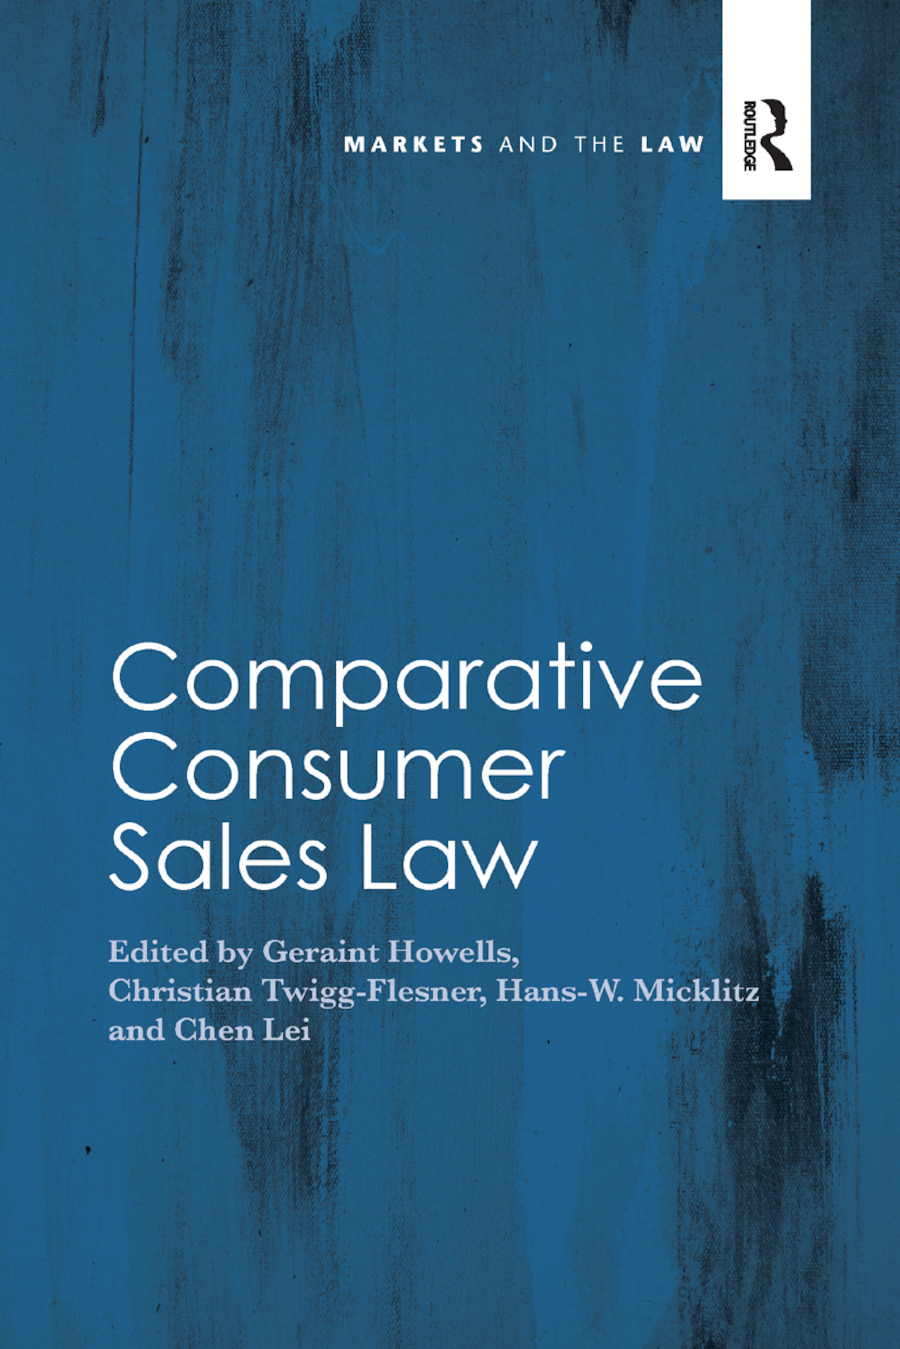 Comparative Consumer Sales Law book cover